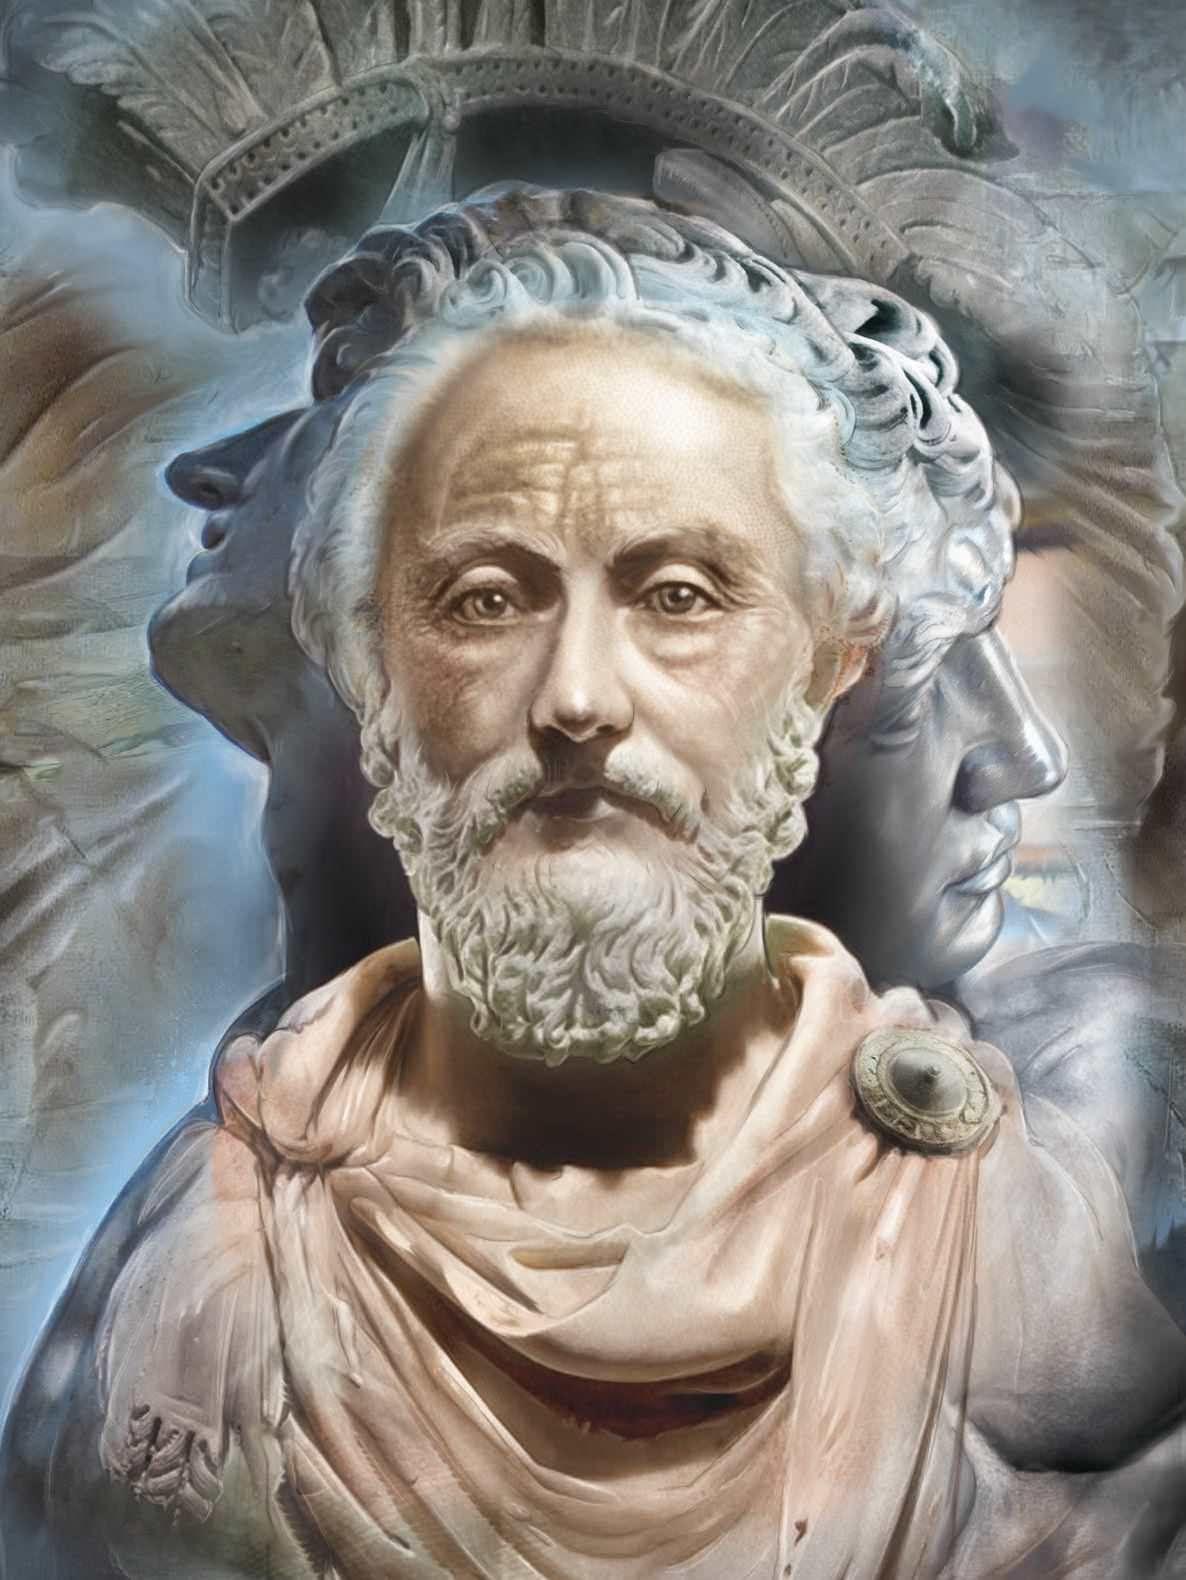 Plutarch's Parallel Lives